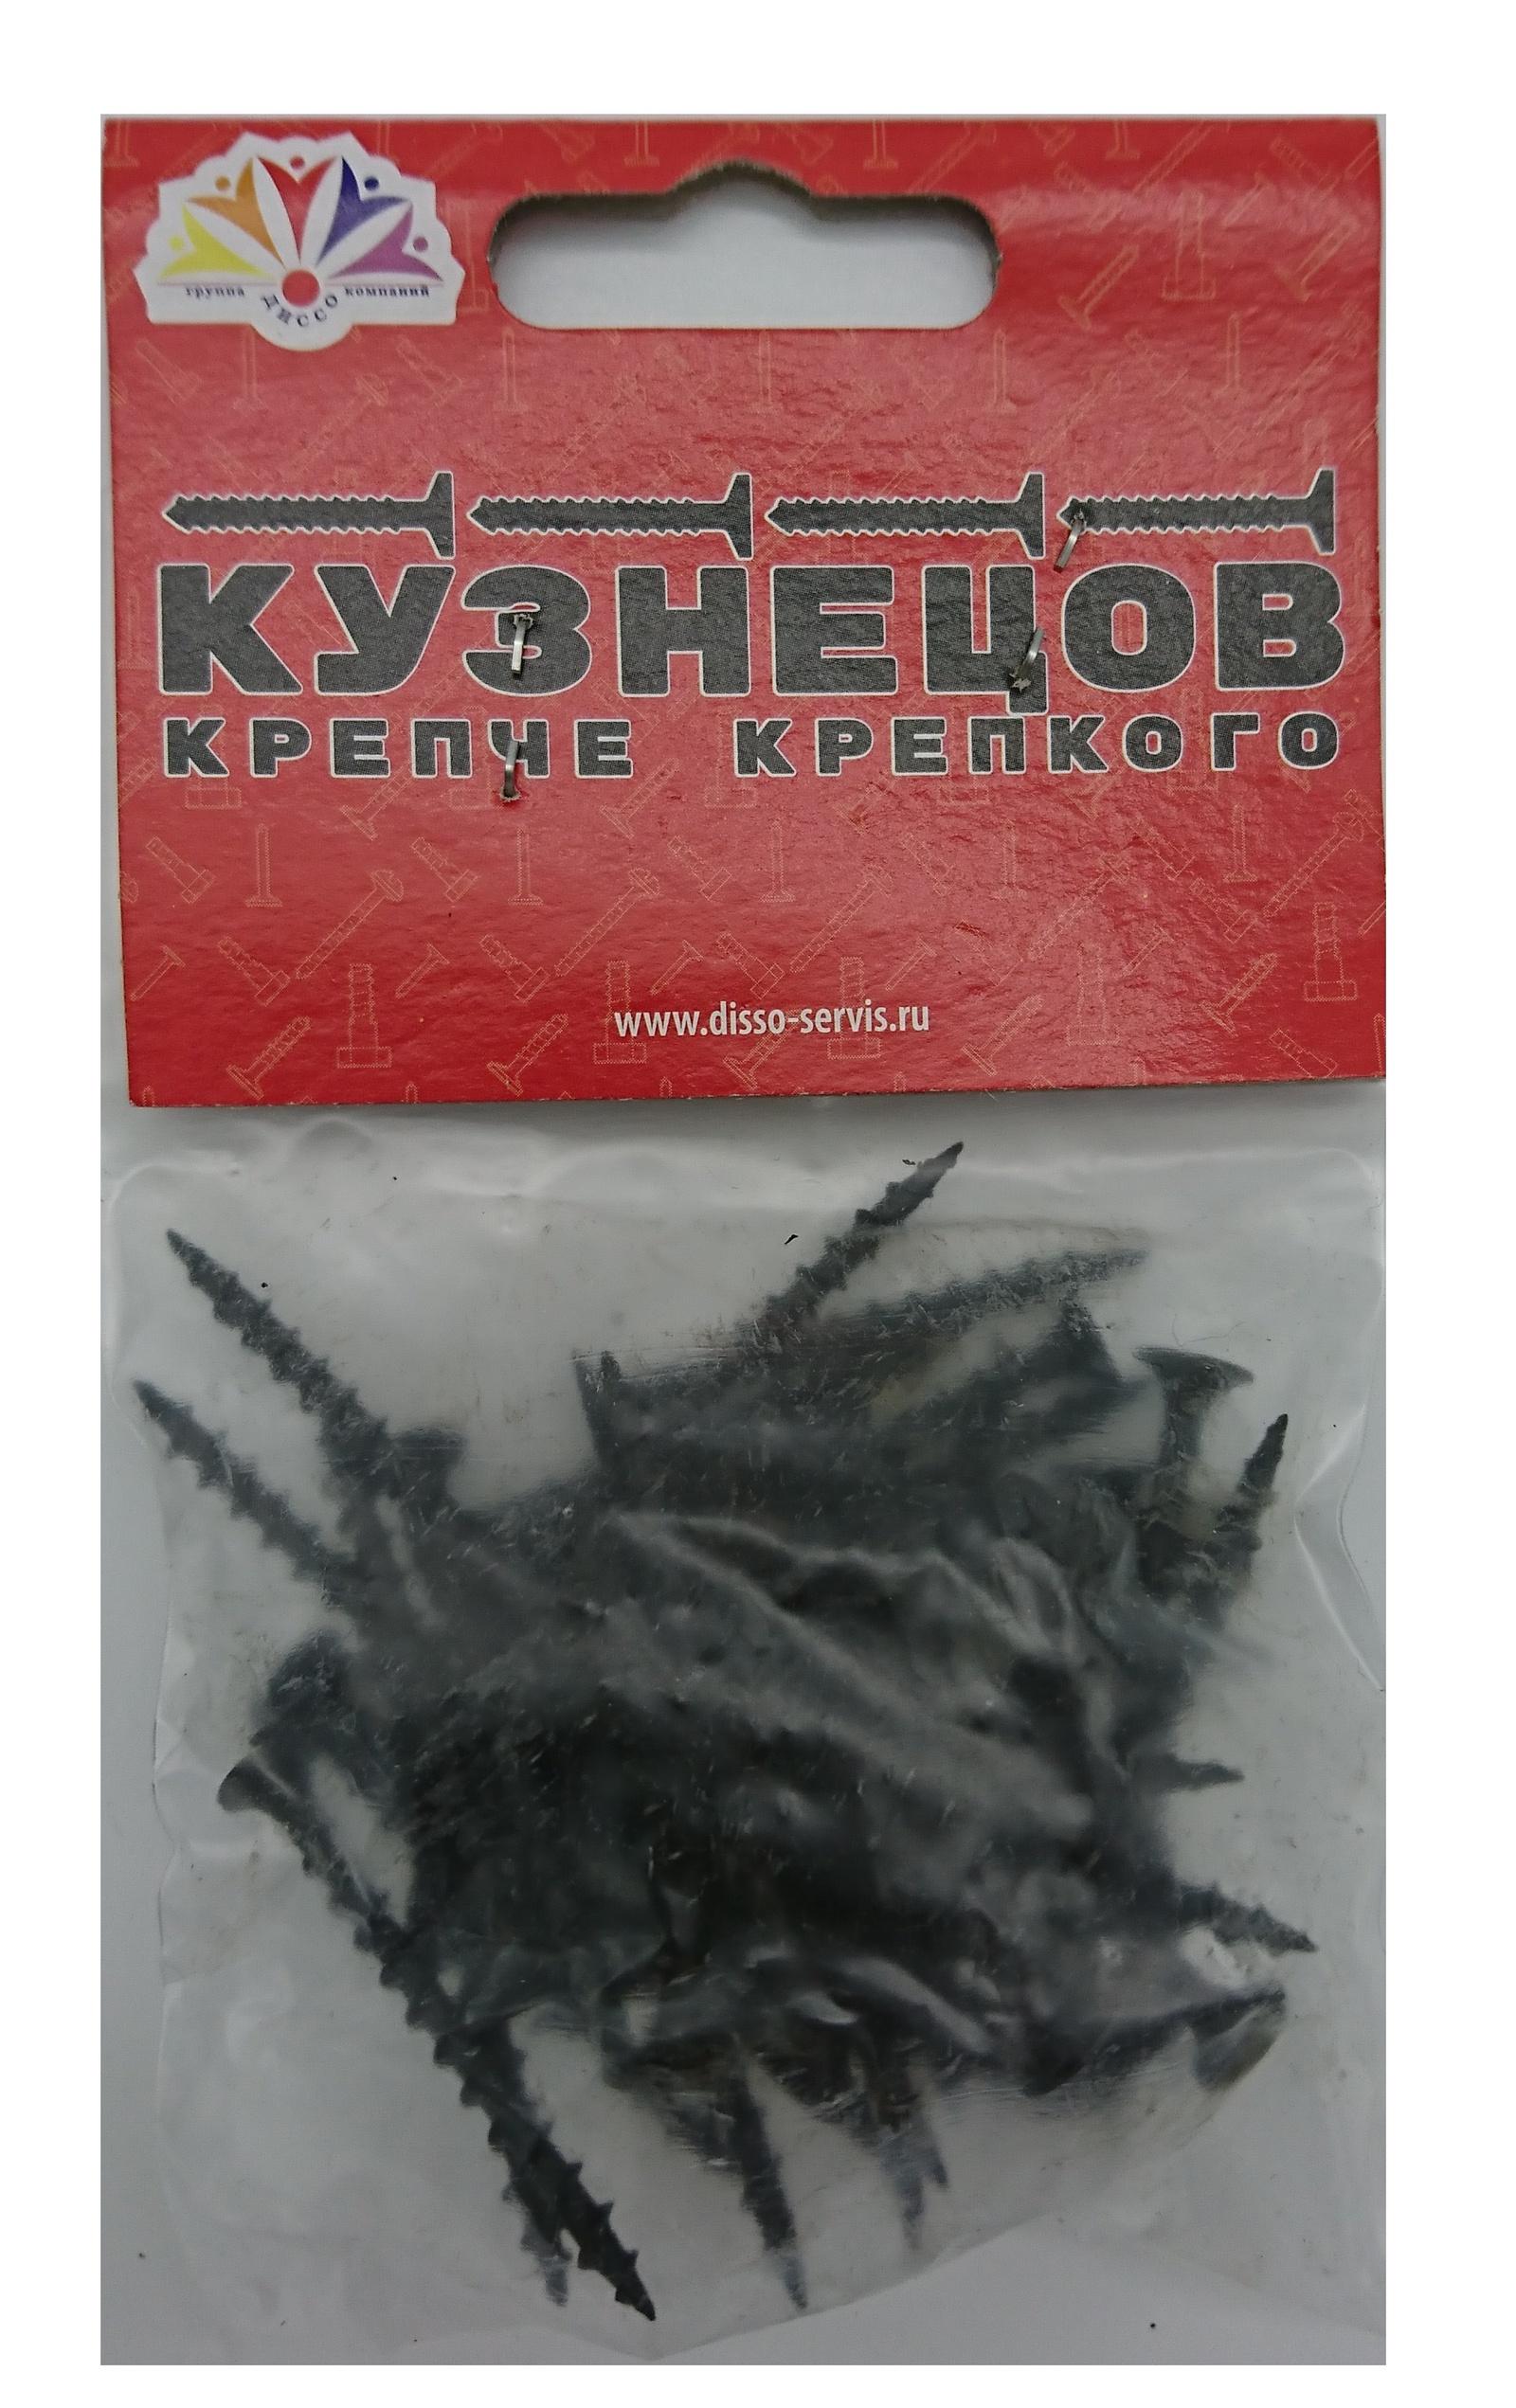 Саморез Кузнецов гипсокартон-дерево 3,5х41 (40 шт. в упаковке) цена 2017